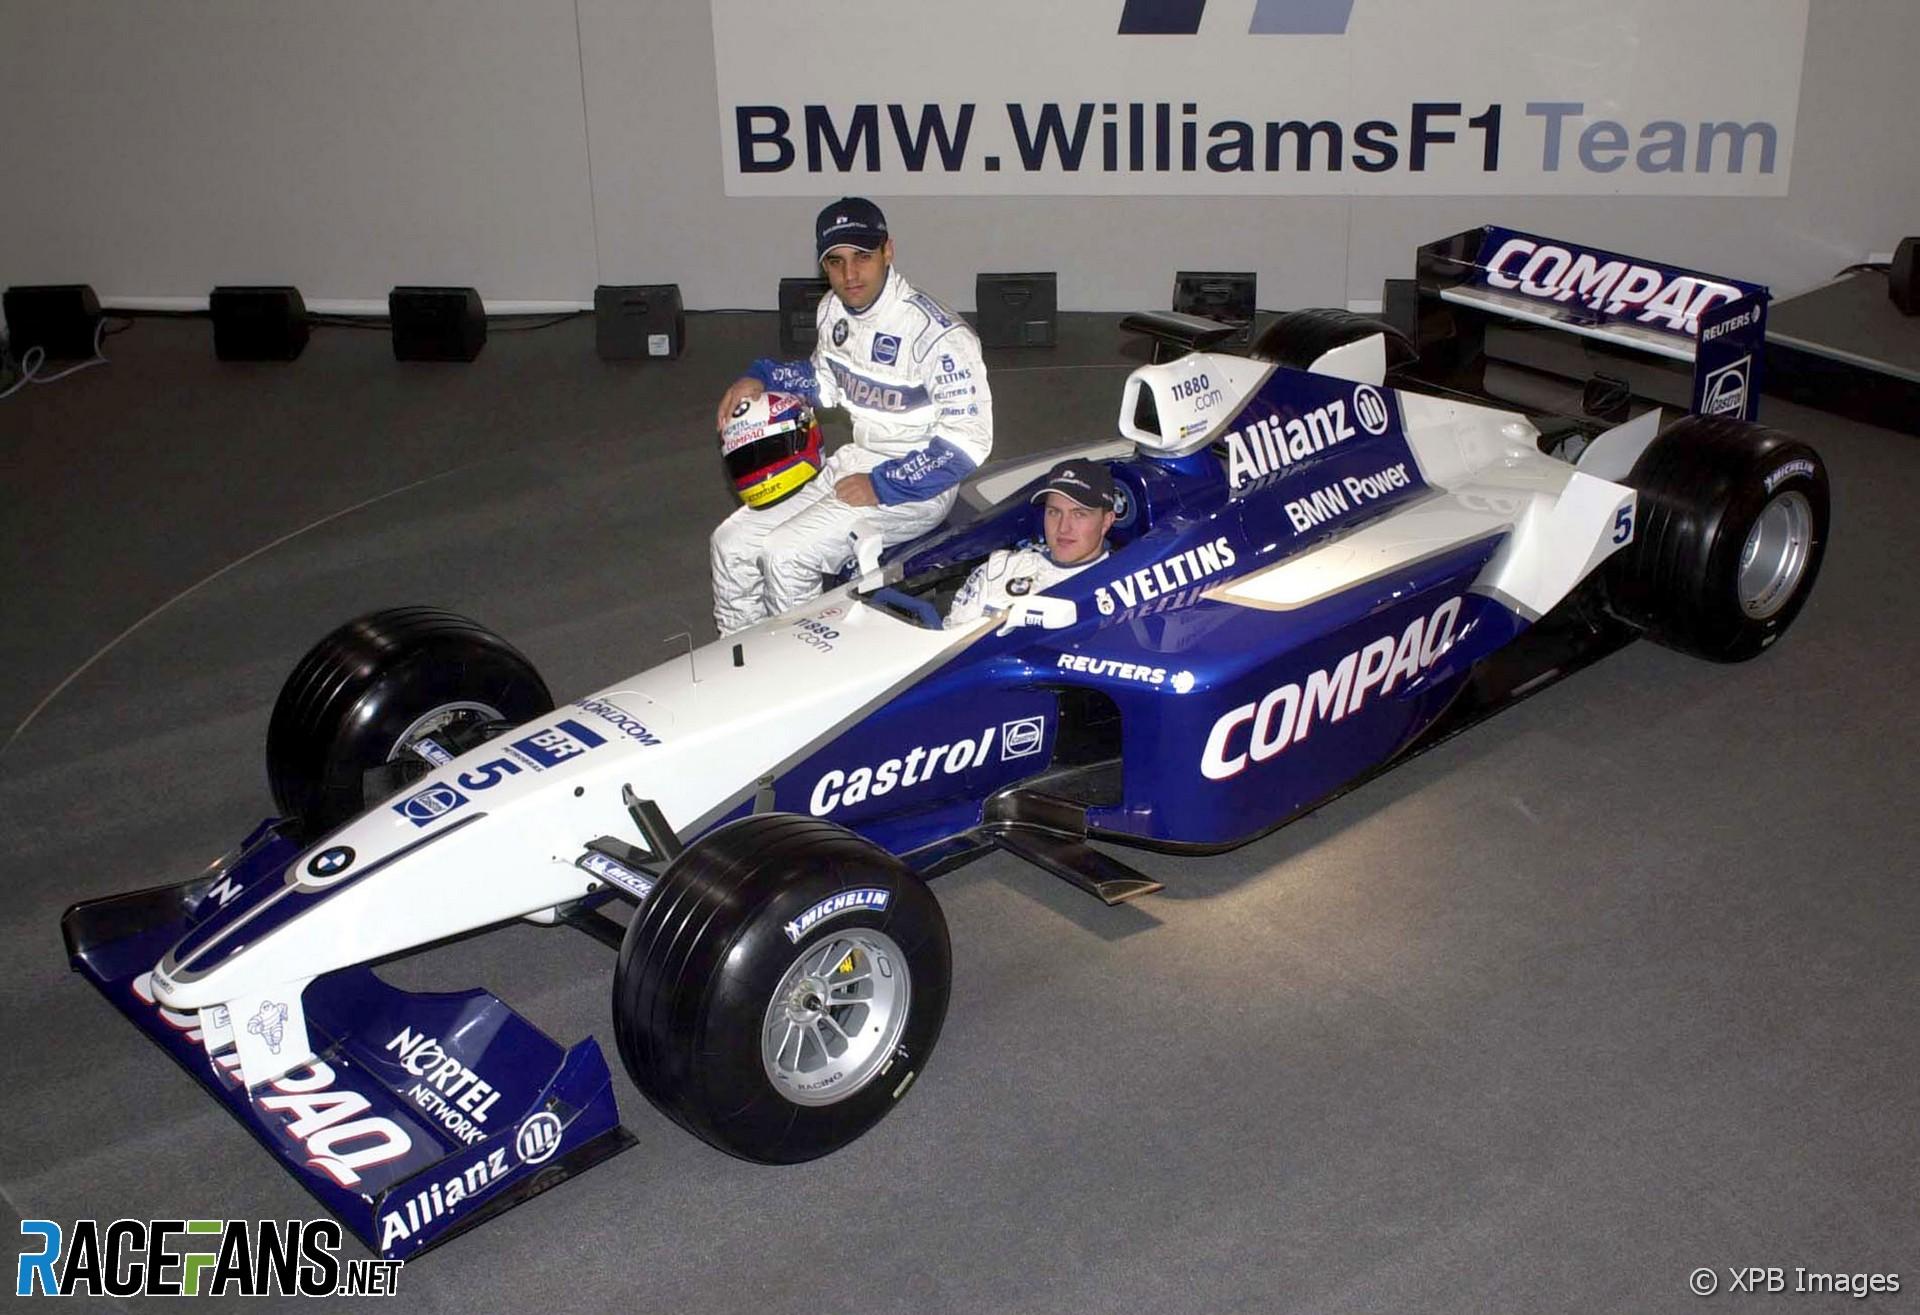 Juan Pablo Montoya, Ralf Schumacher, Williams FW23 launch, 2001